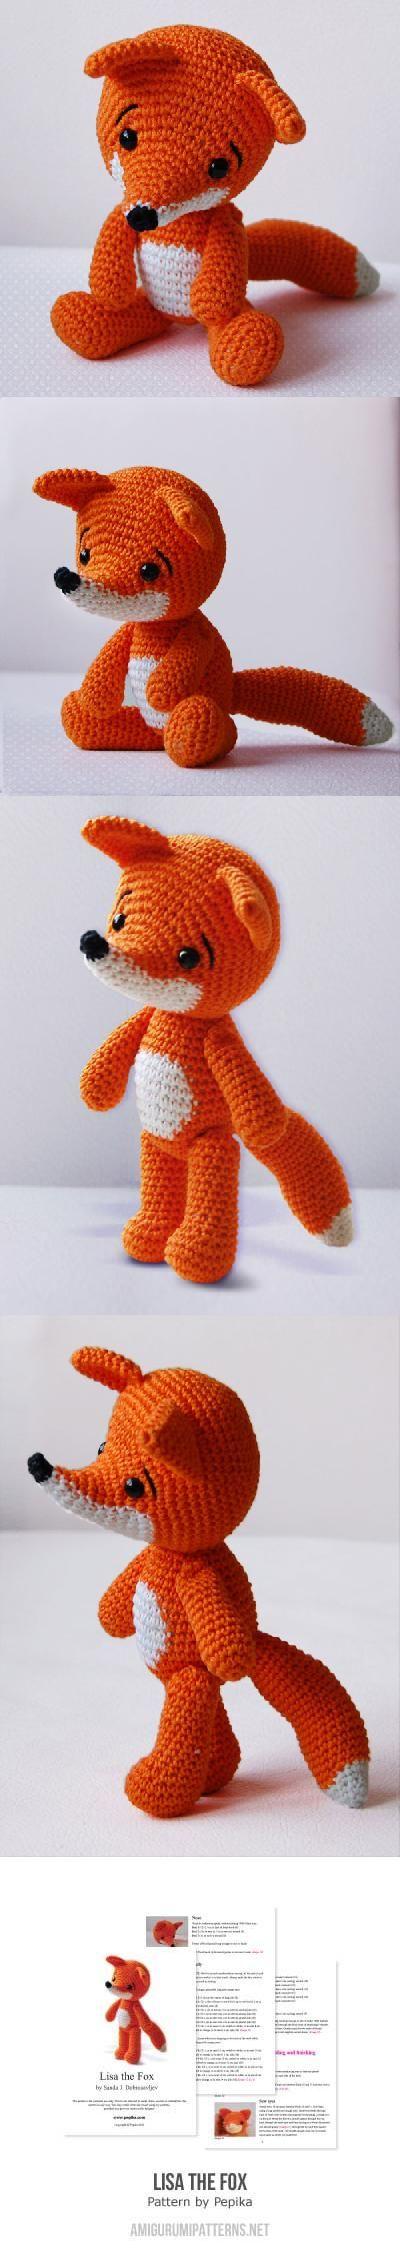 Lisa the Fox amigurumi pattern by Pepika | Tejido, Patrones ...